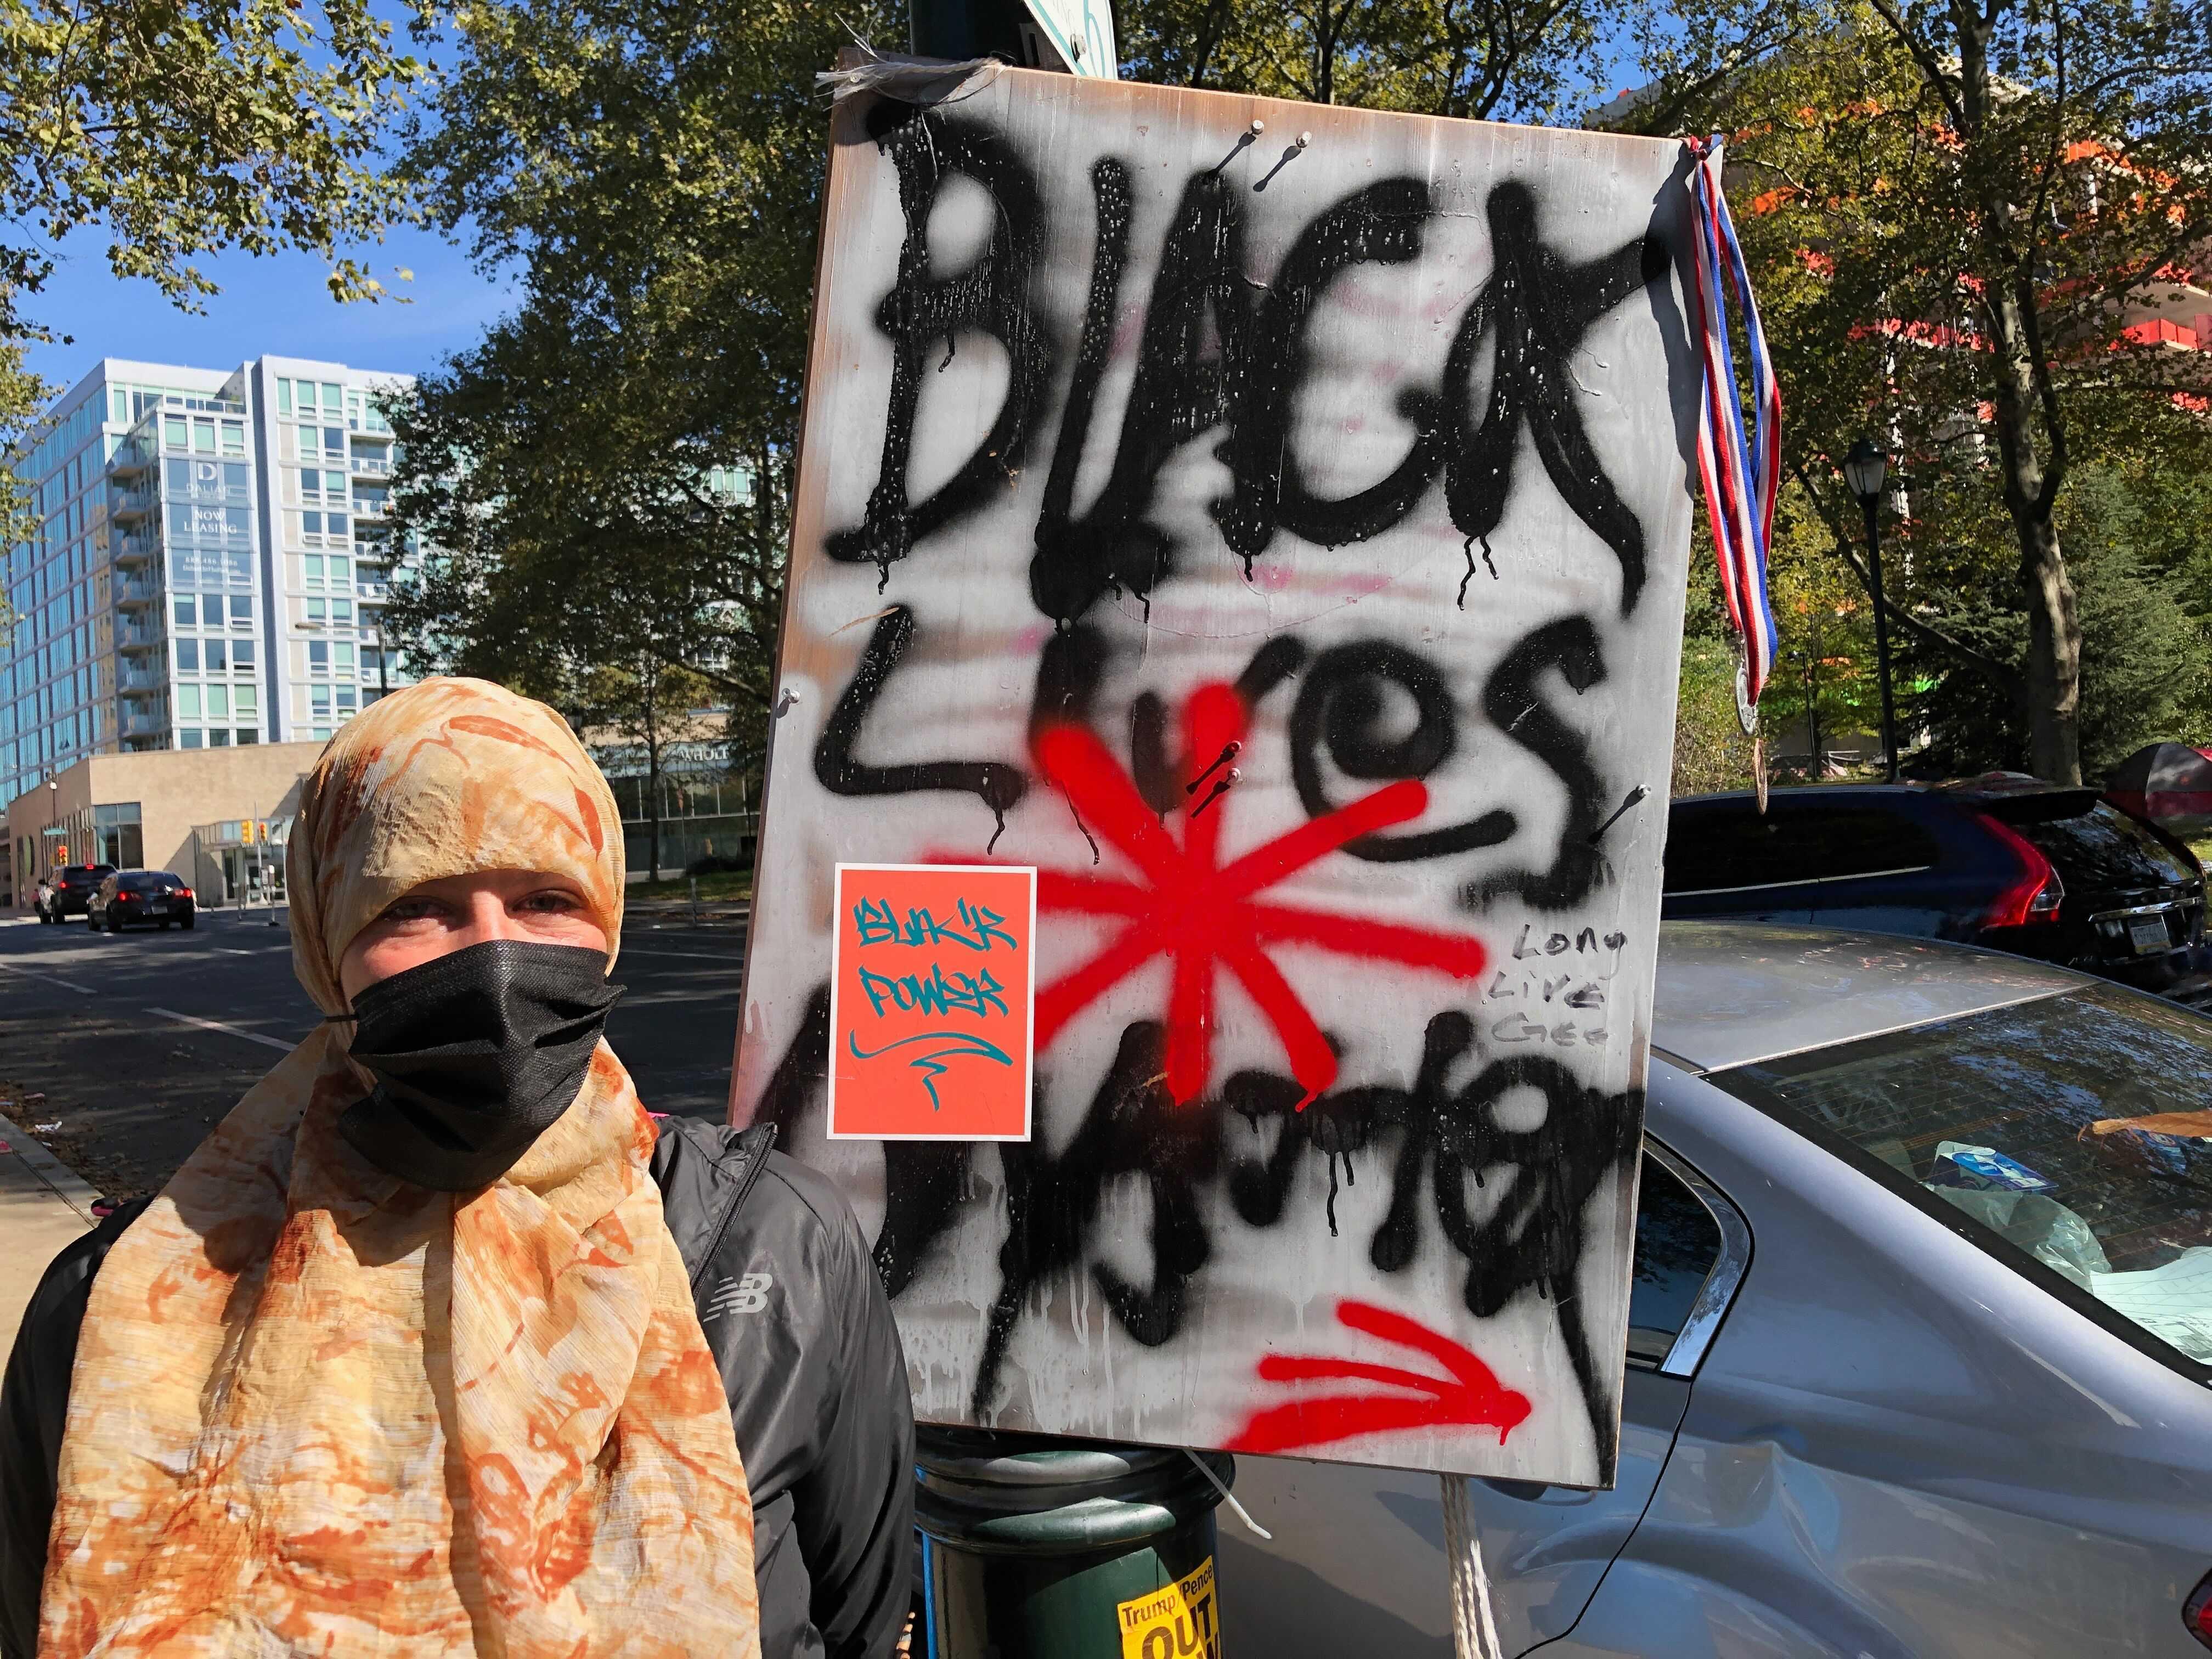 Housing activist Jenn Bennetch with Black Lives Matter sign